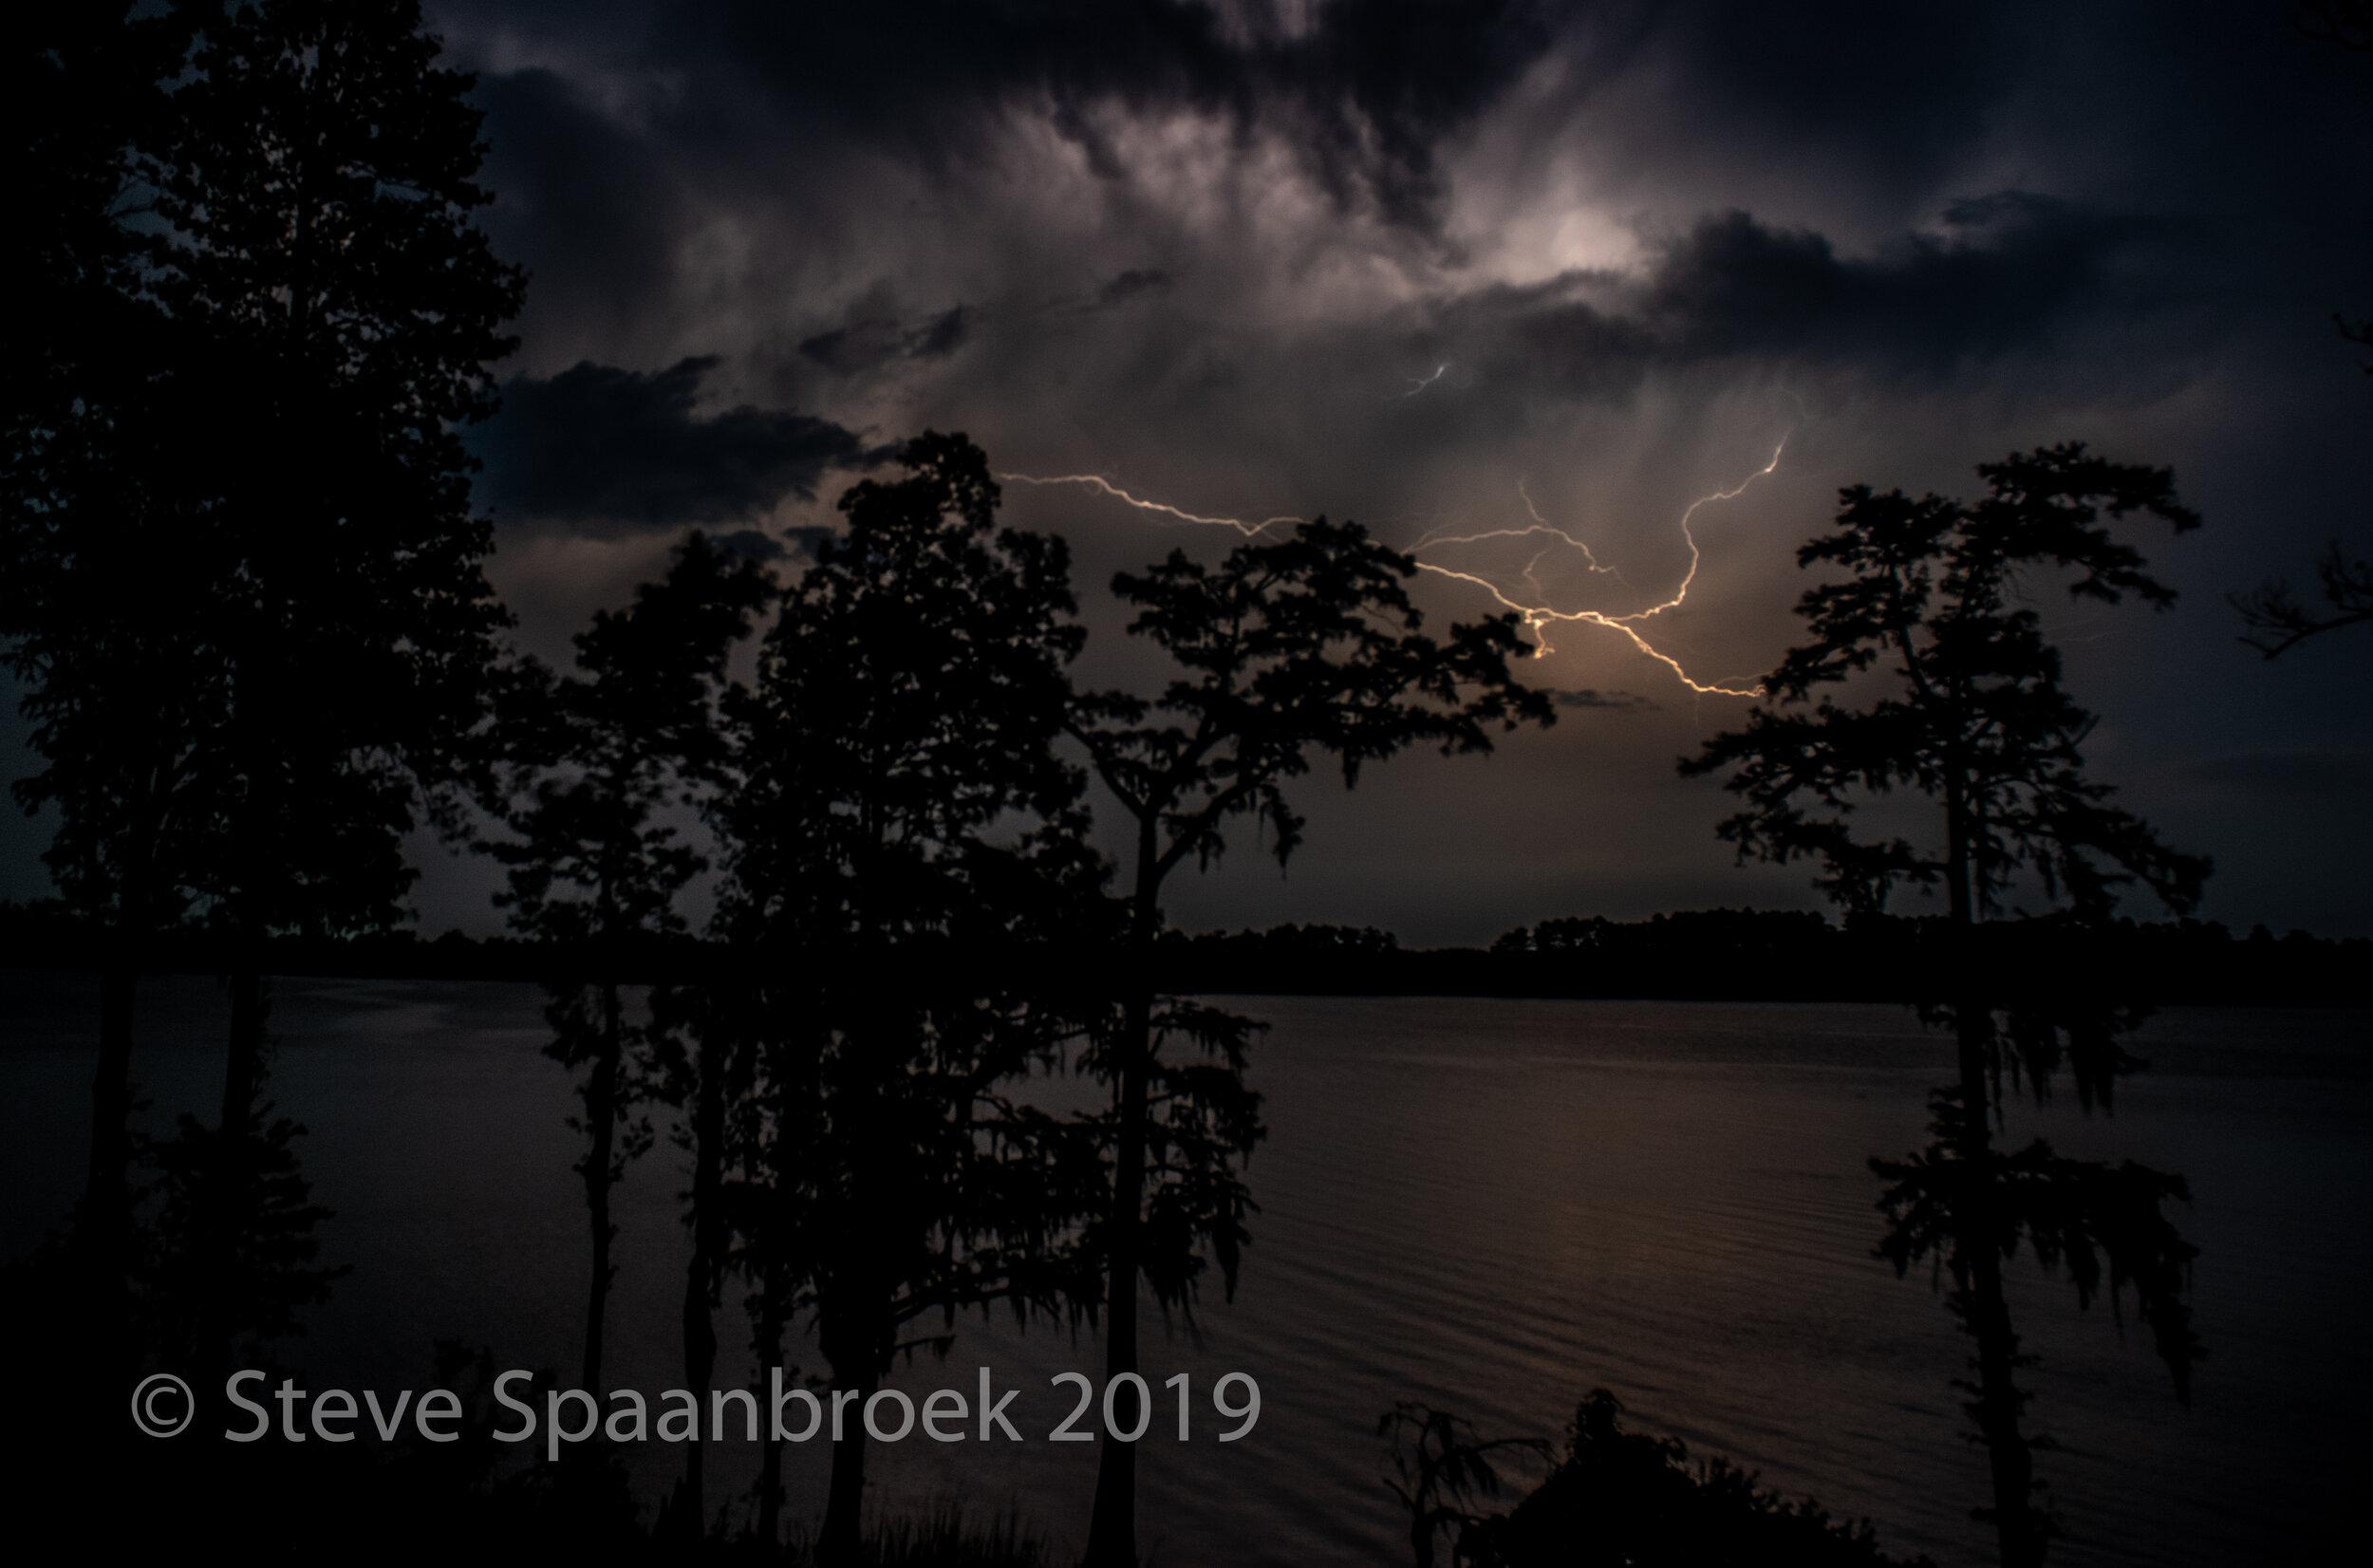 Thunderstorm over Chocowinity Bay